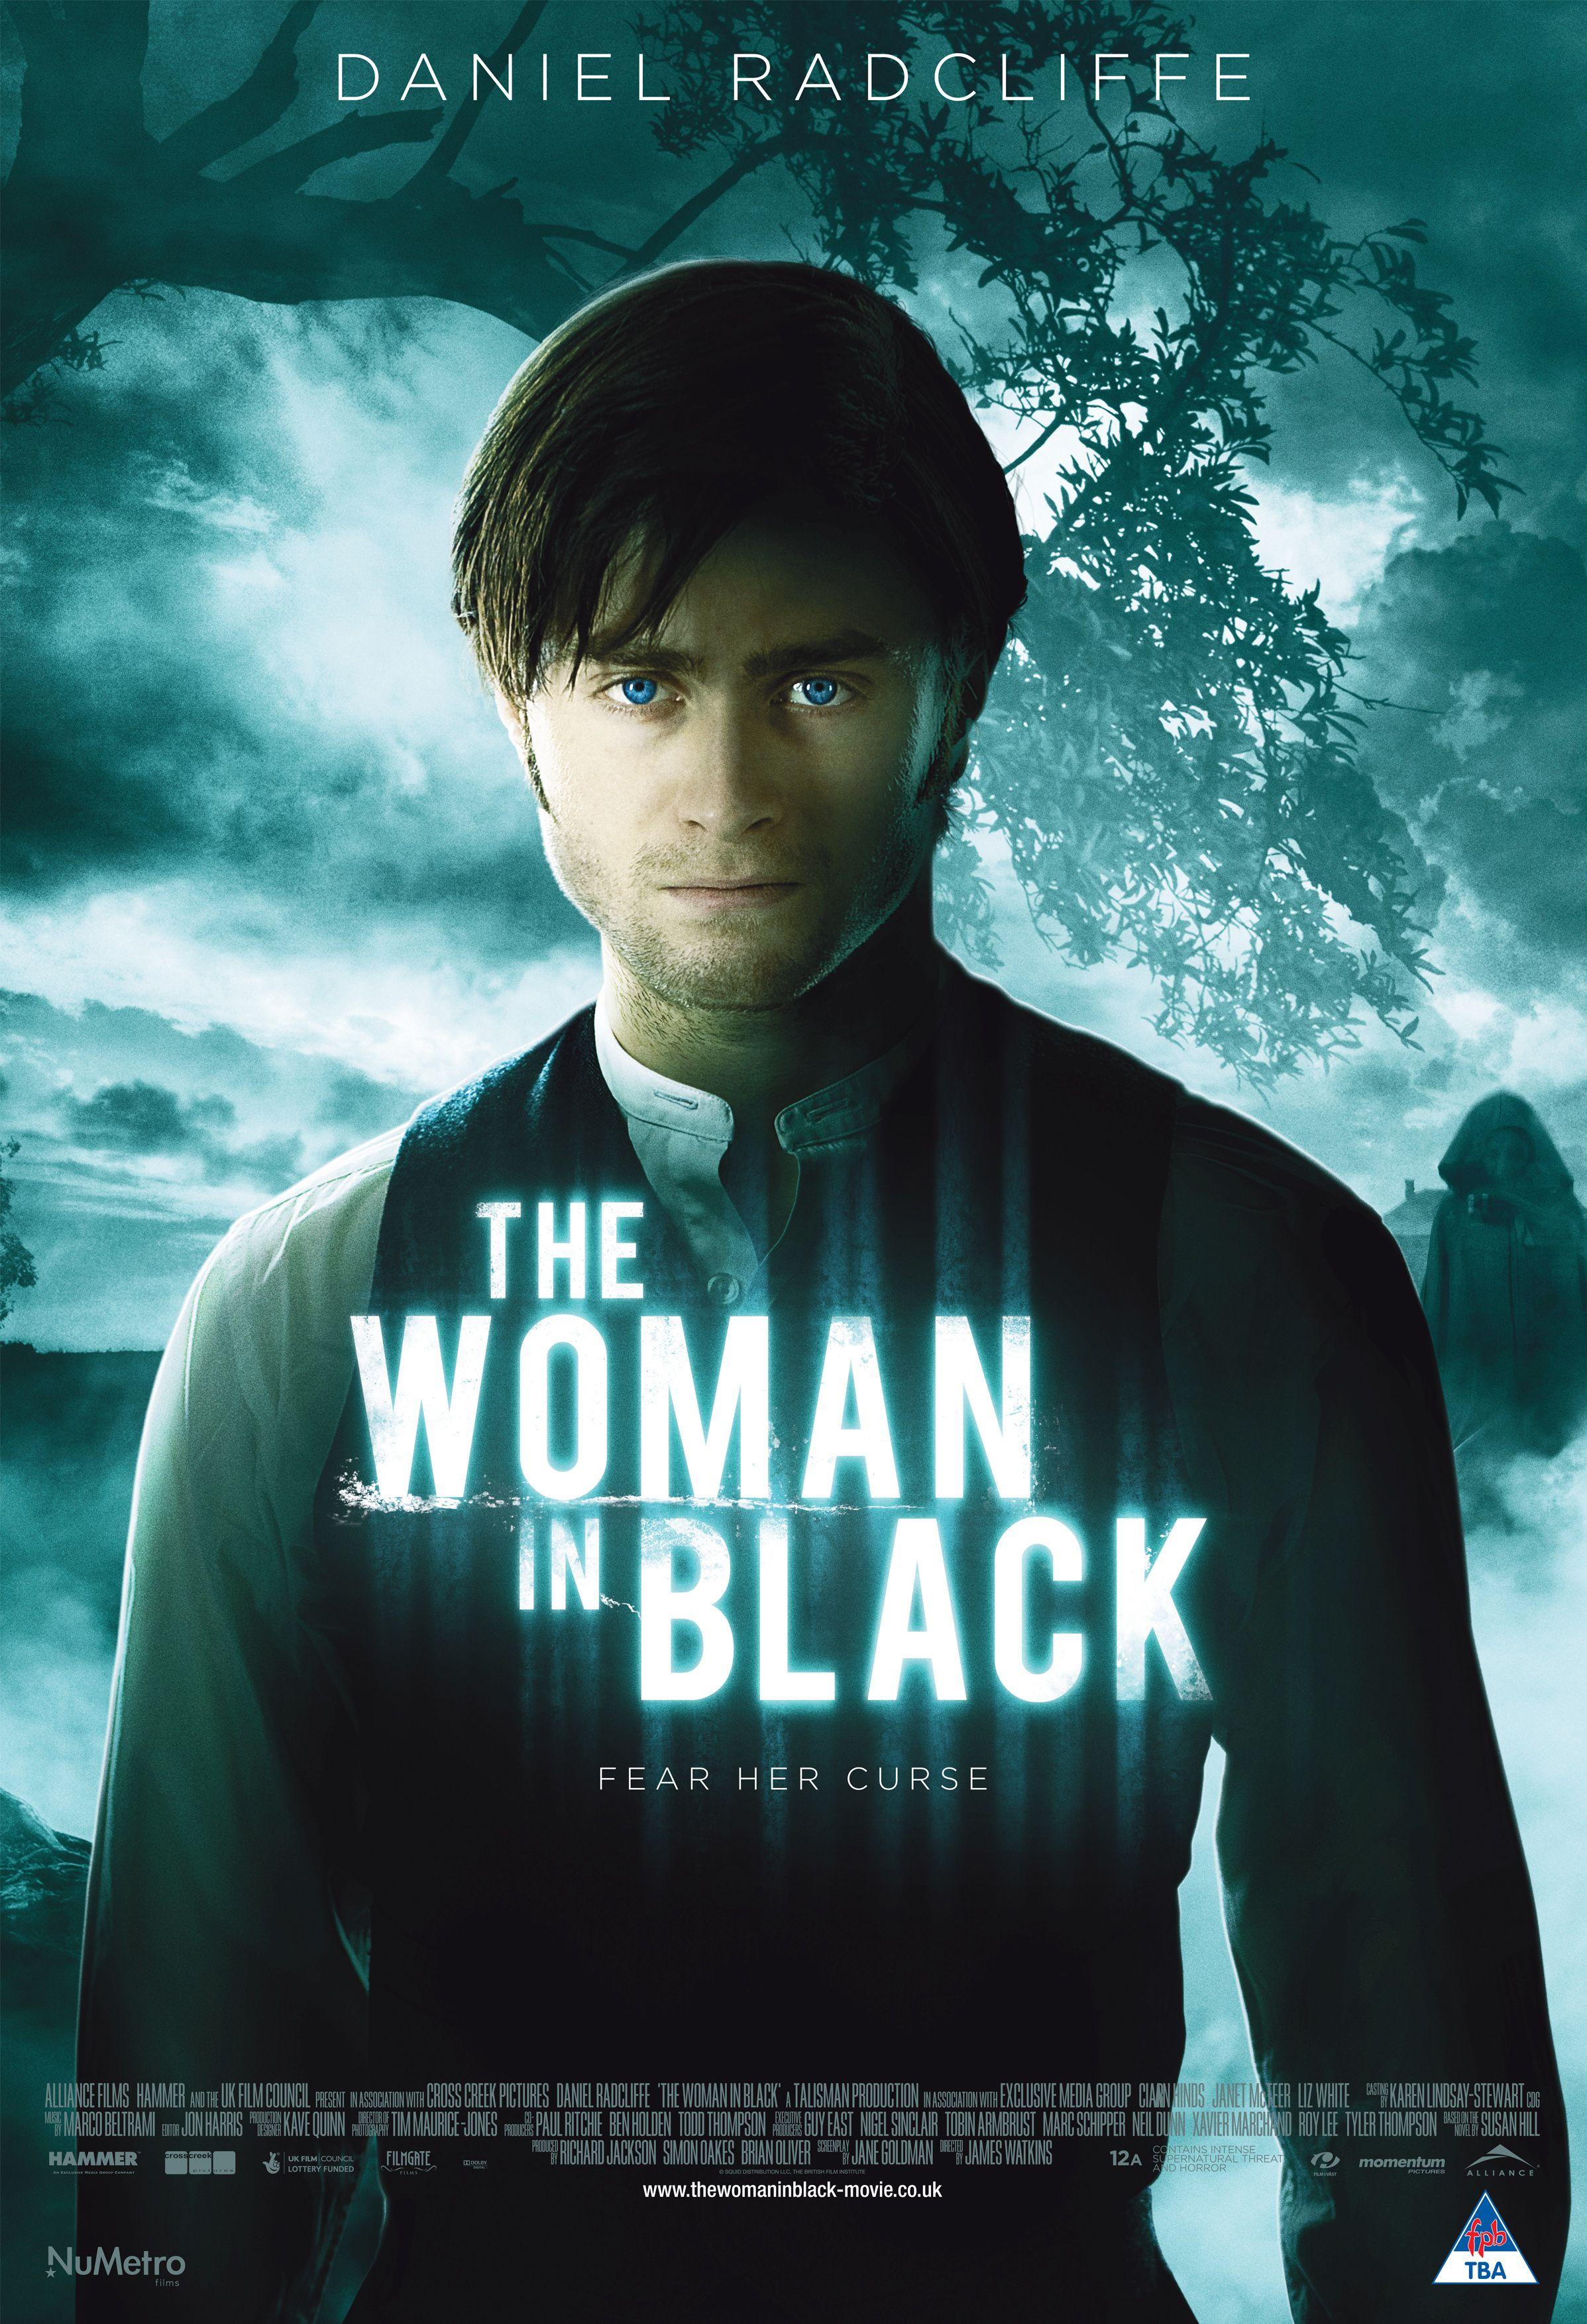 'The Woman in Black' - Daniel Radcliffe horror-thriller. Fear her curse. Ciaràn Hinds.